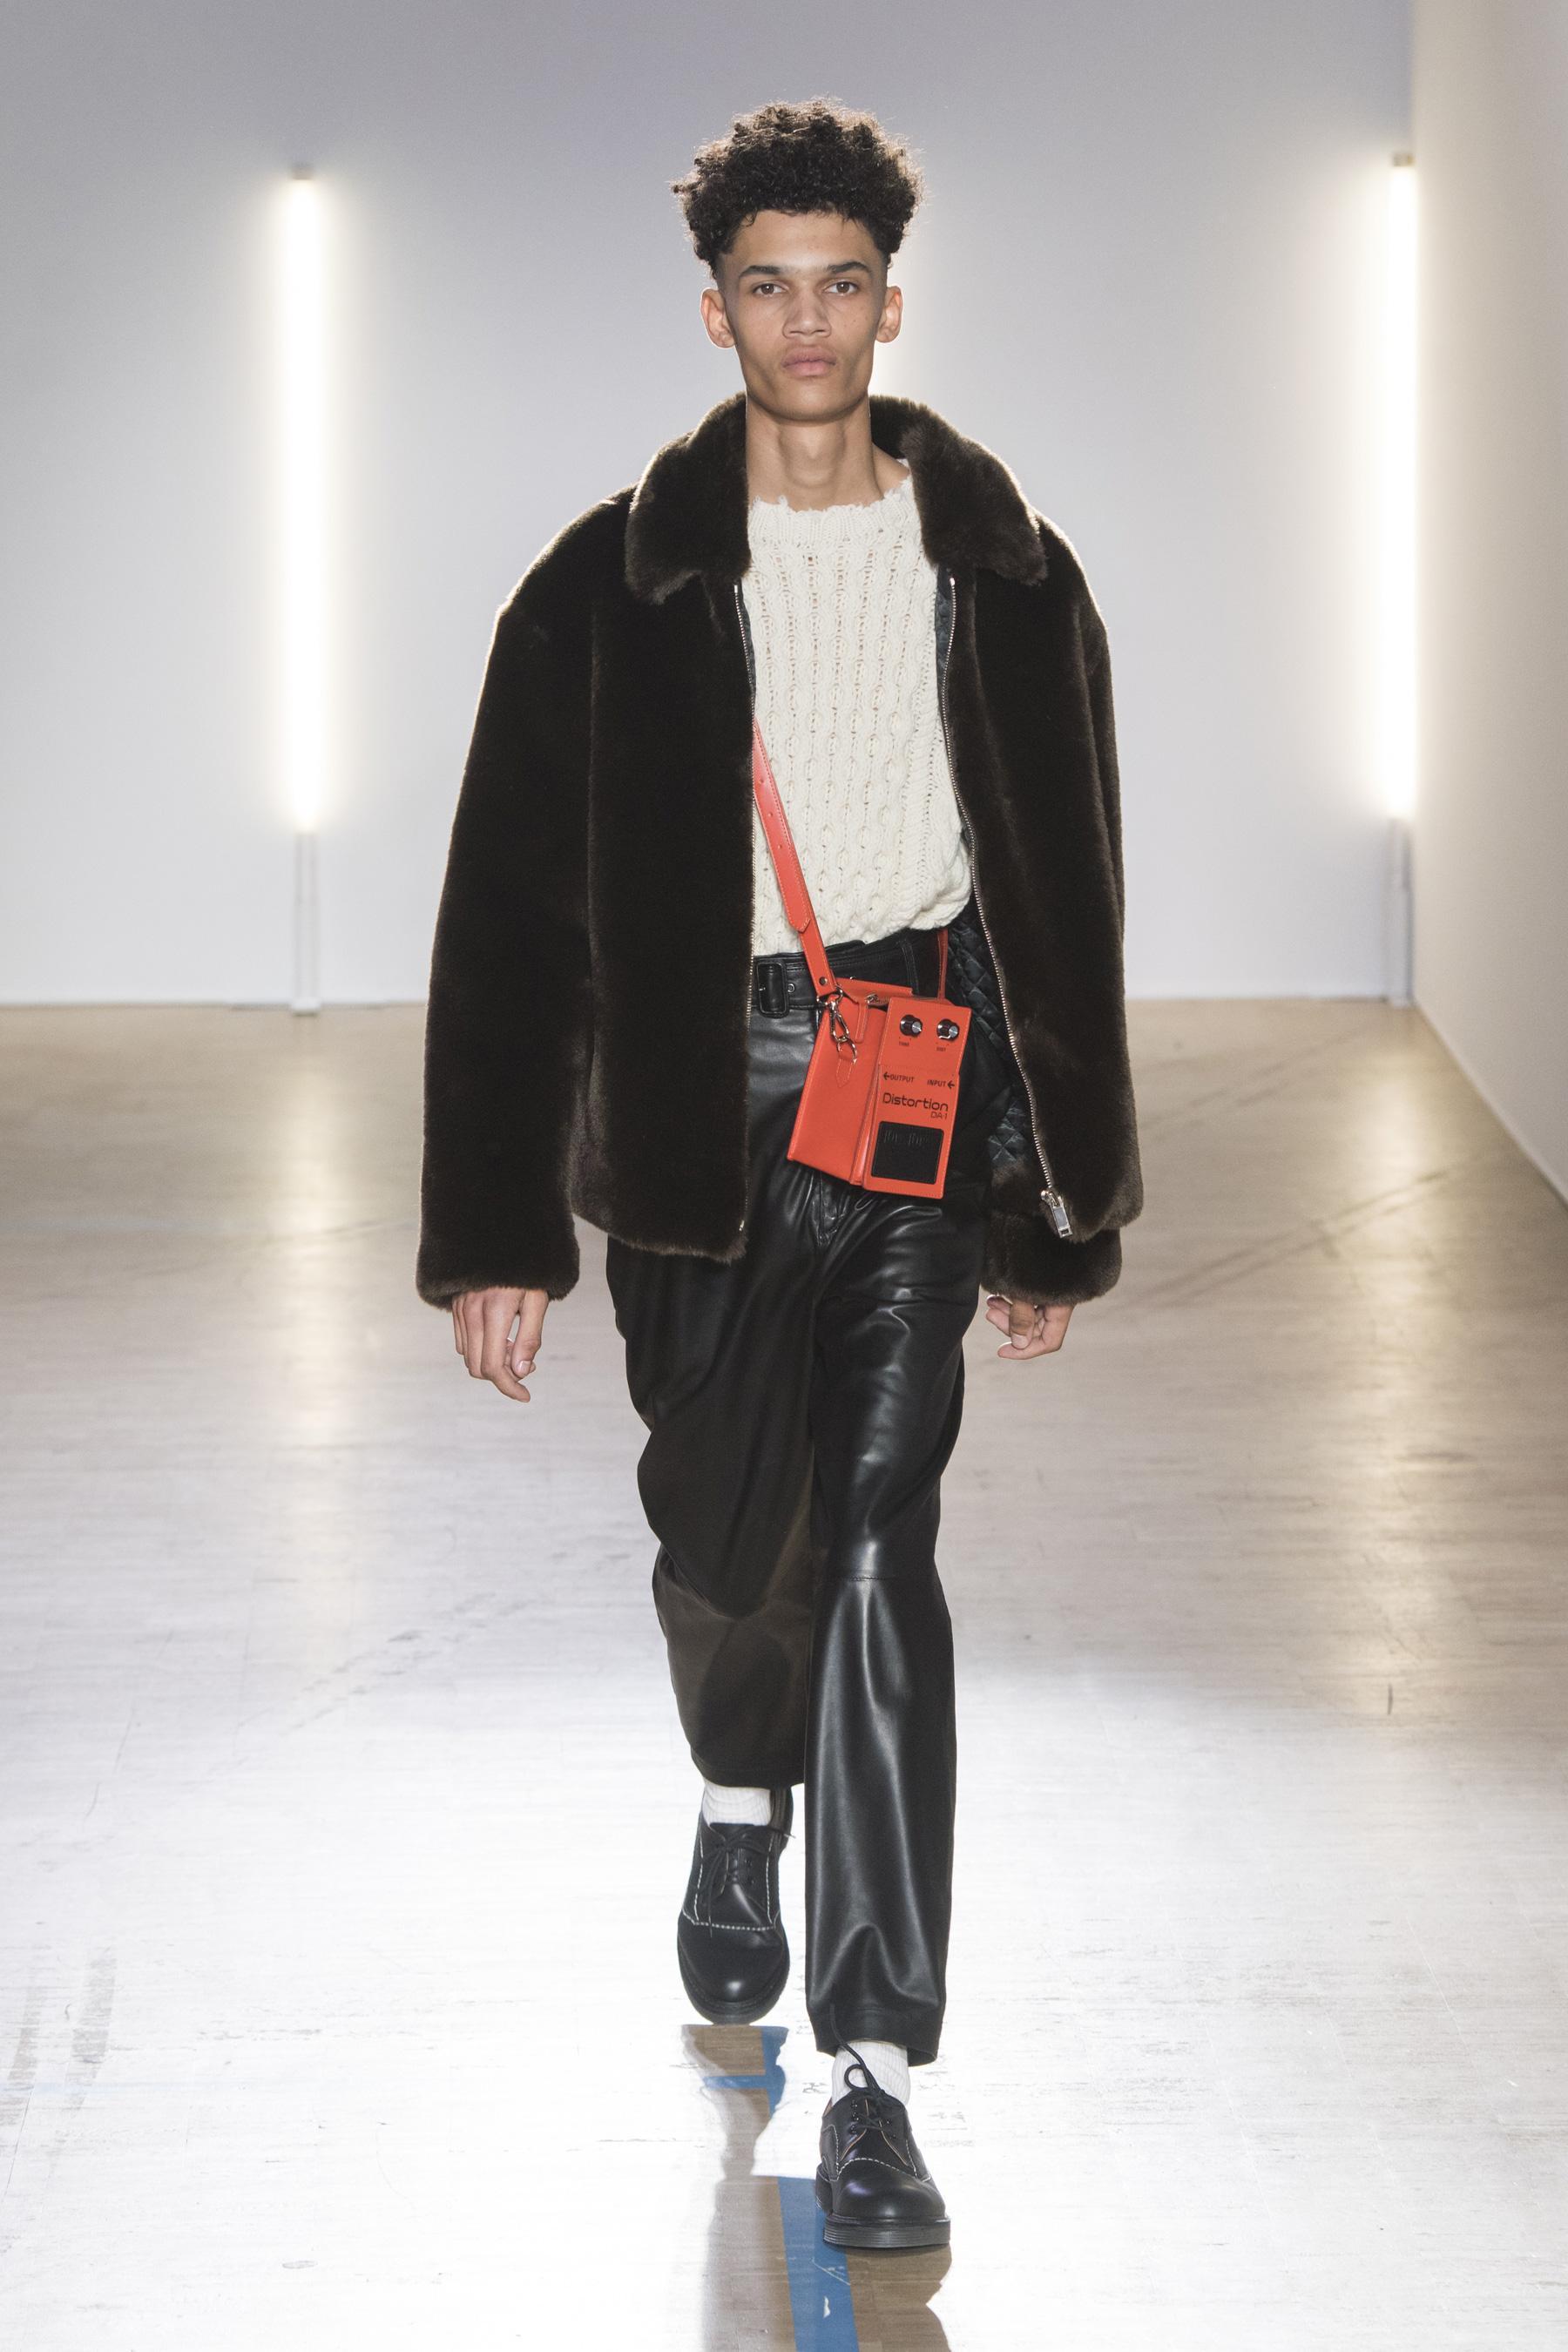 Défilé Christian Dada automne-hiver 2018-2019 Homme - Madame Figaro 257d1f0dda70